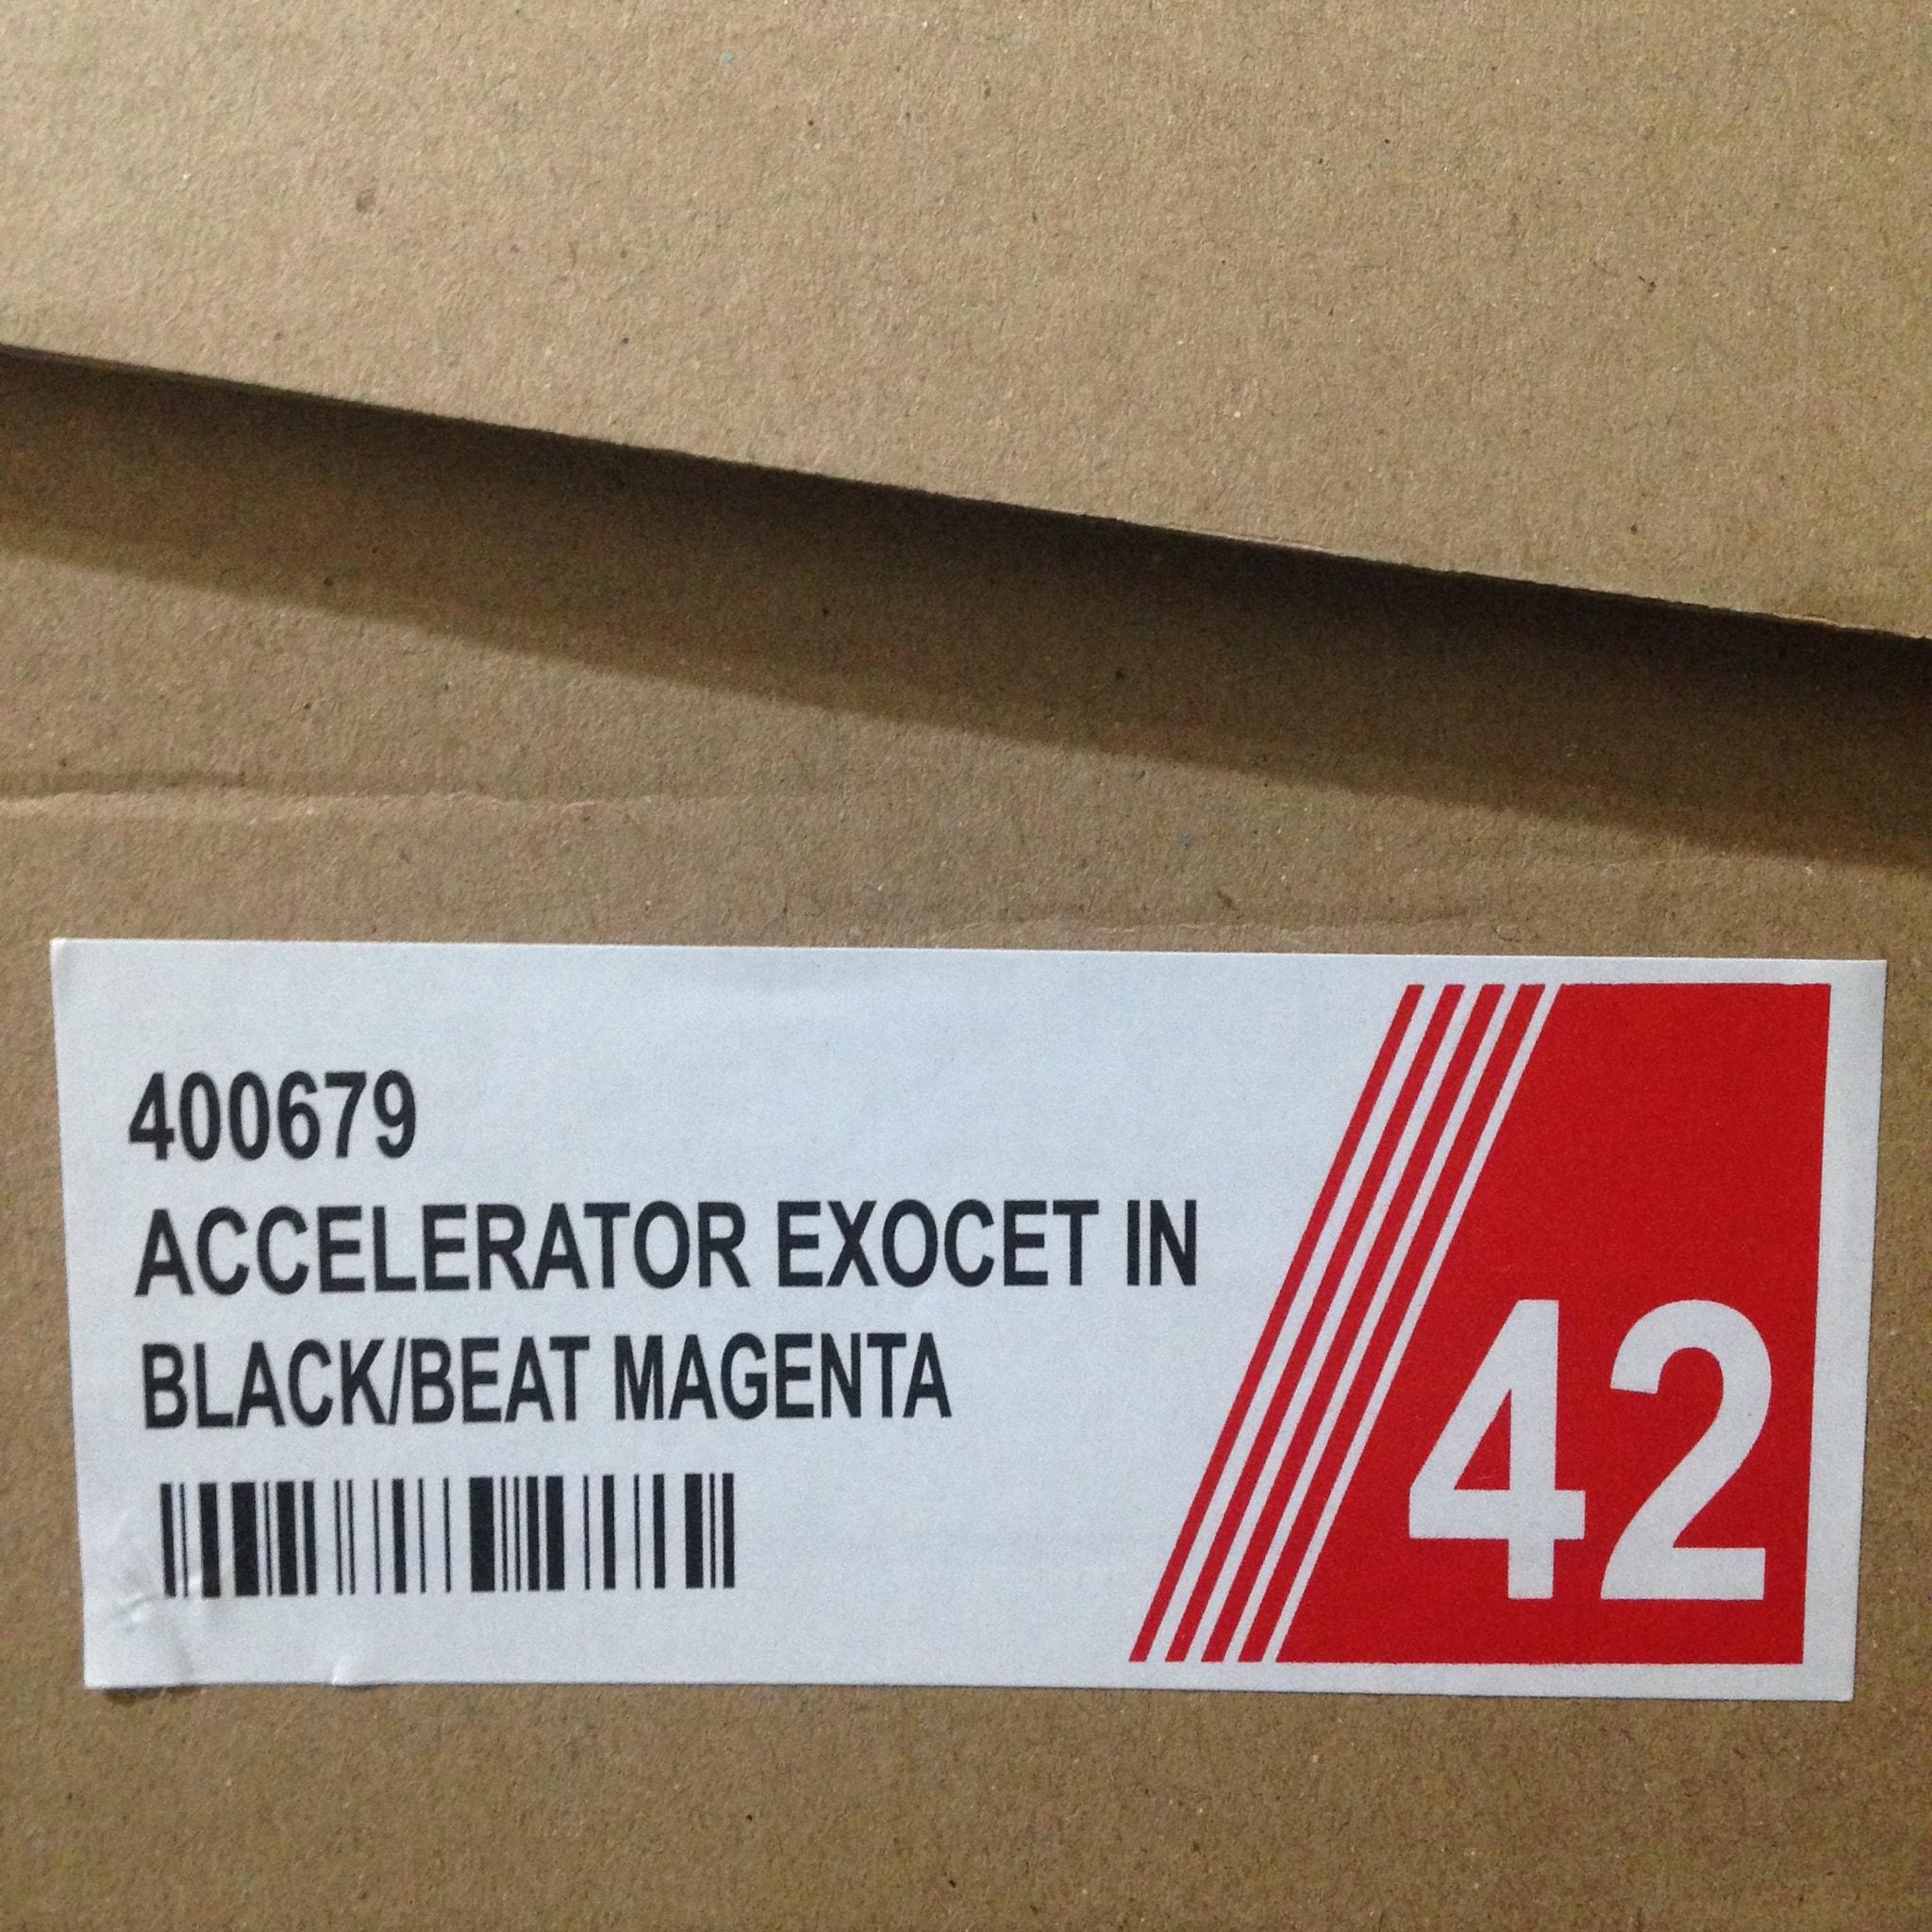 ... Sepatu Futsal Specs Accelerator Exocet In Black 400679 Original Bnib -  Blanja.com 19ce25a693cce